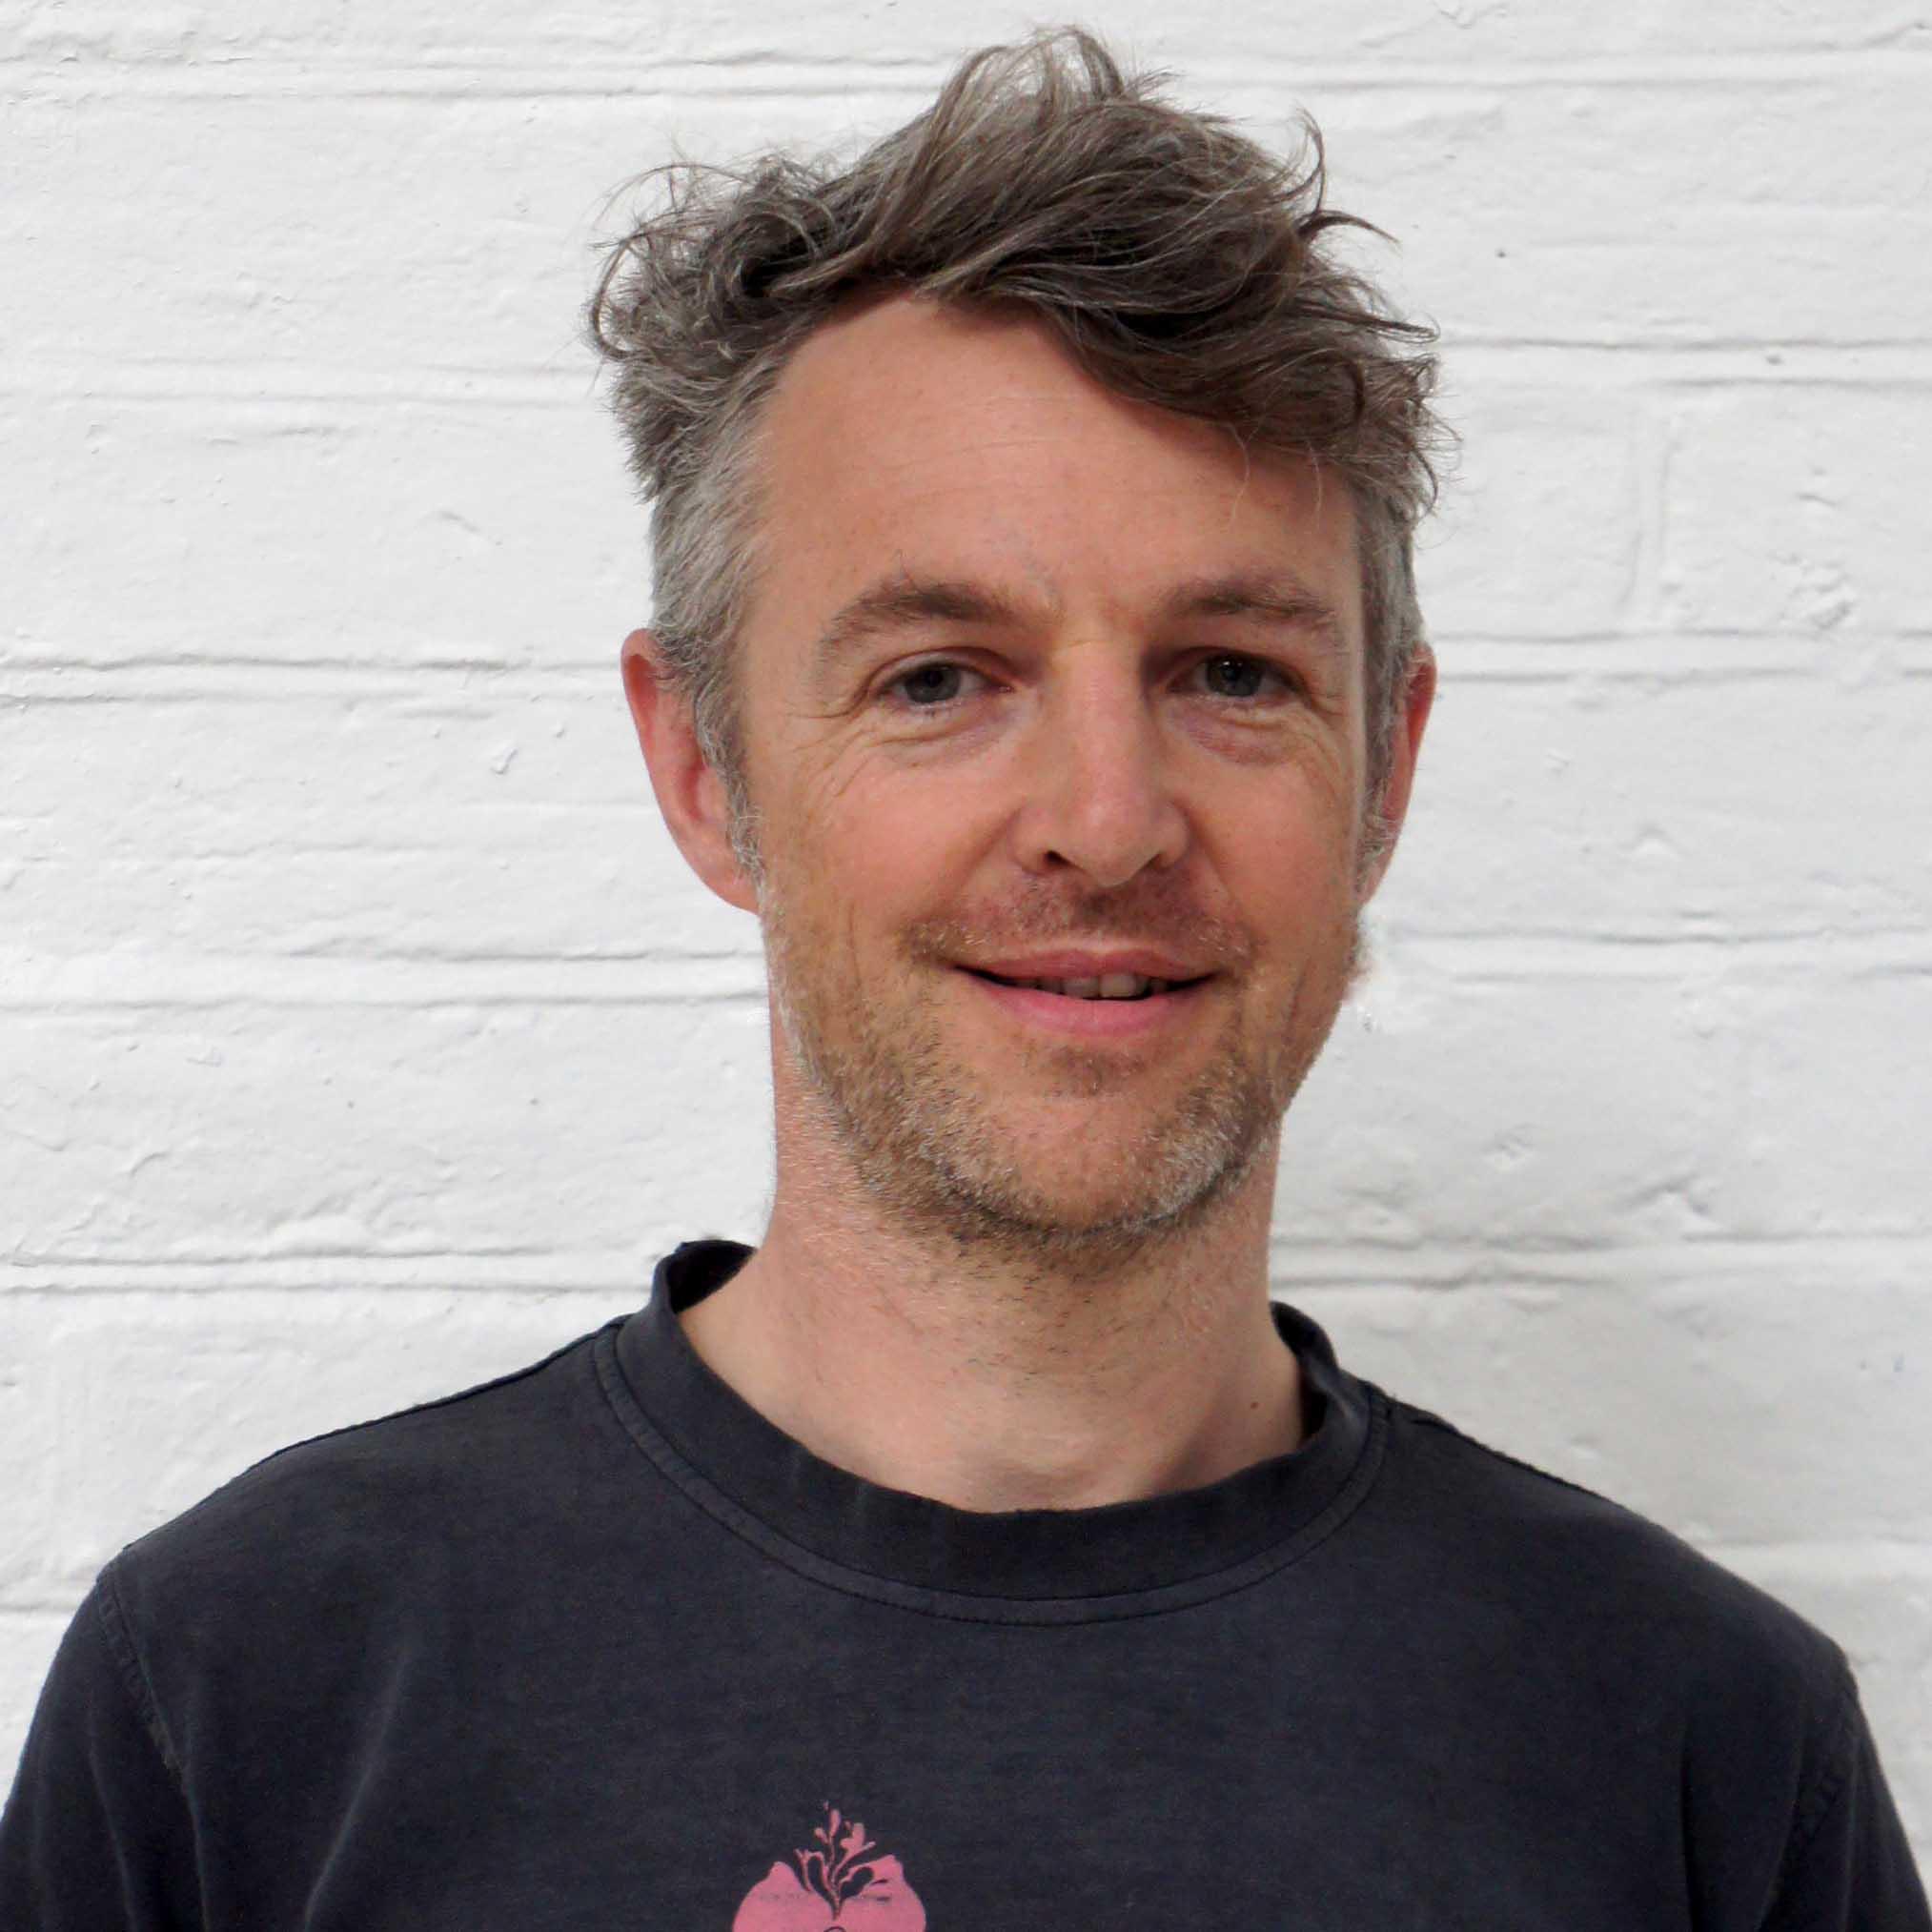 Alex Saunders